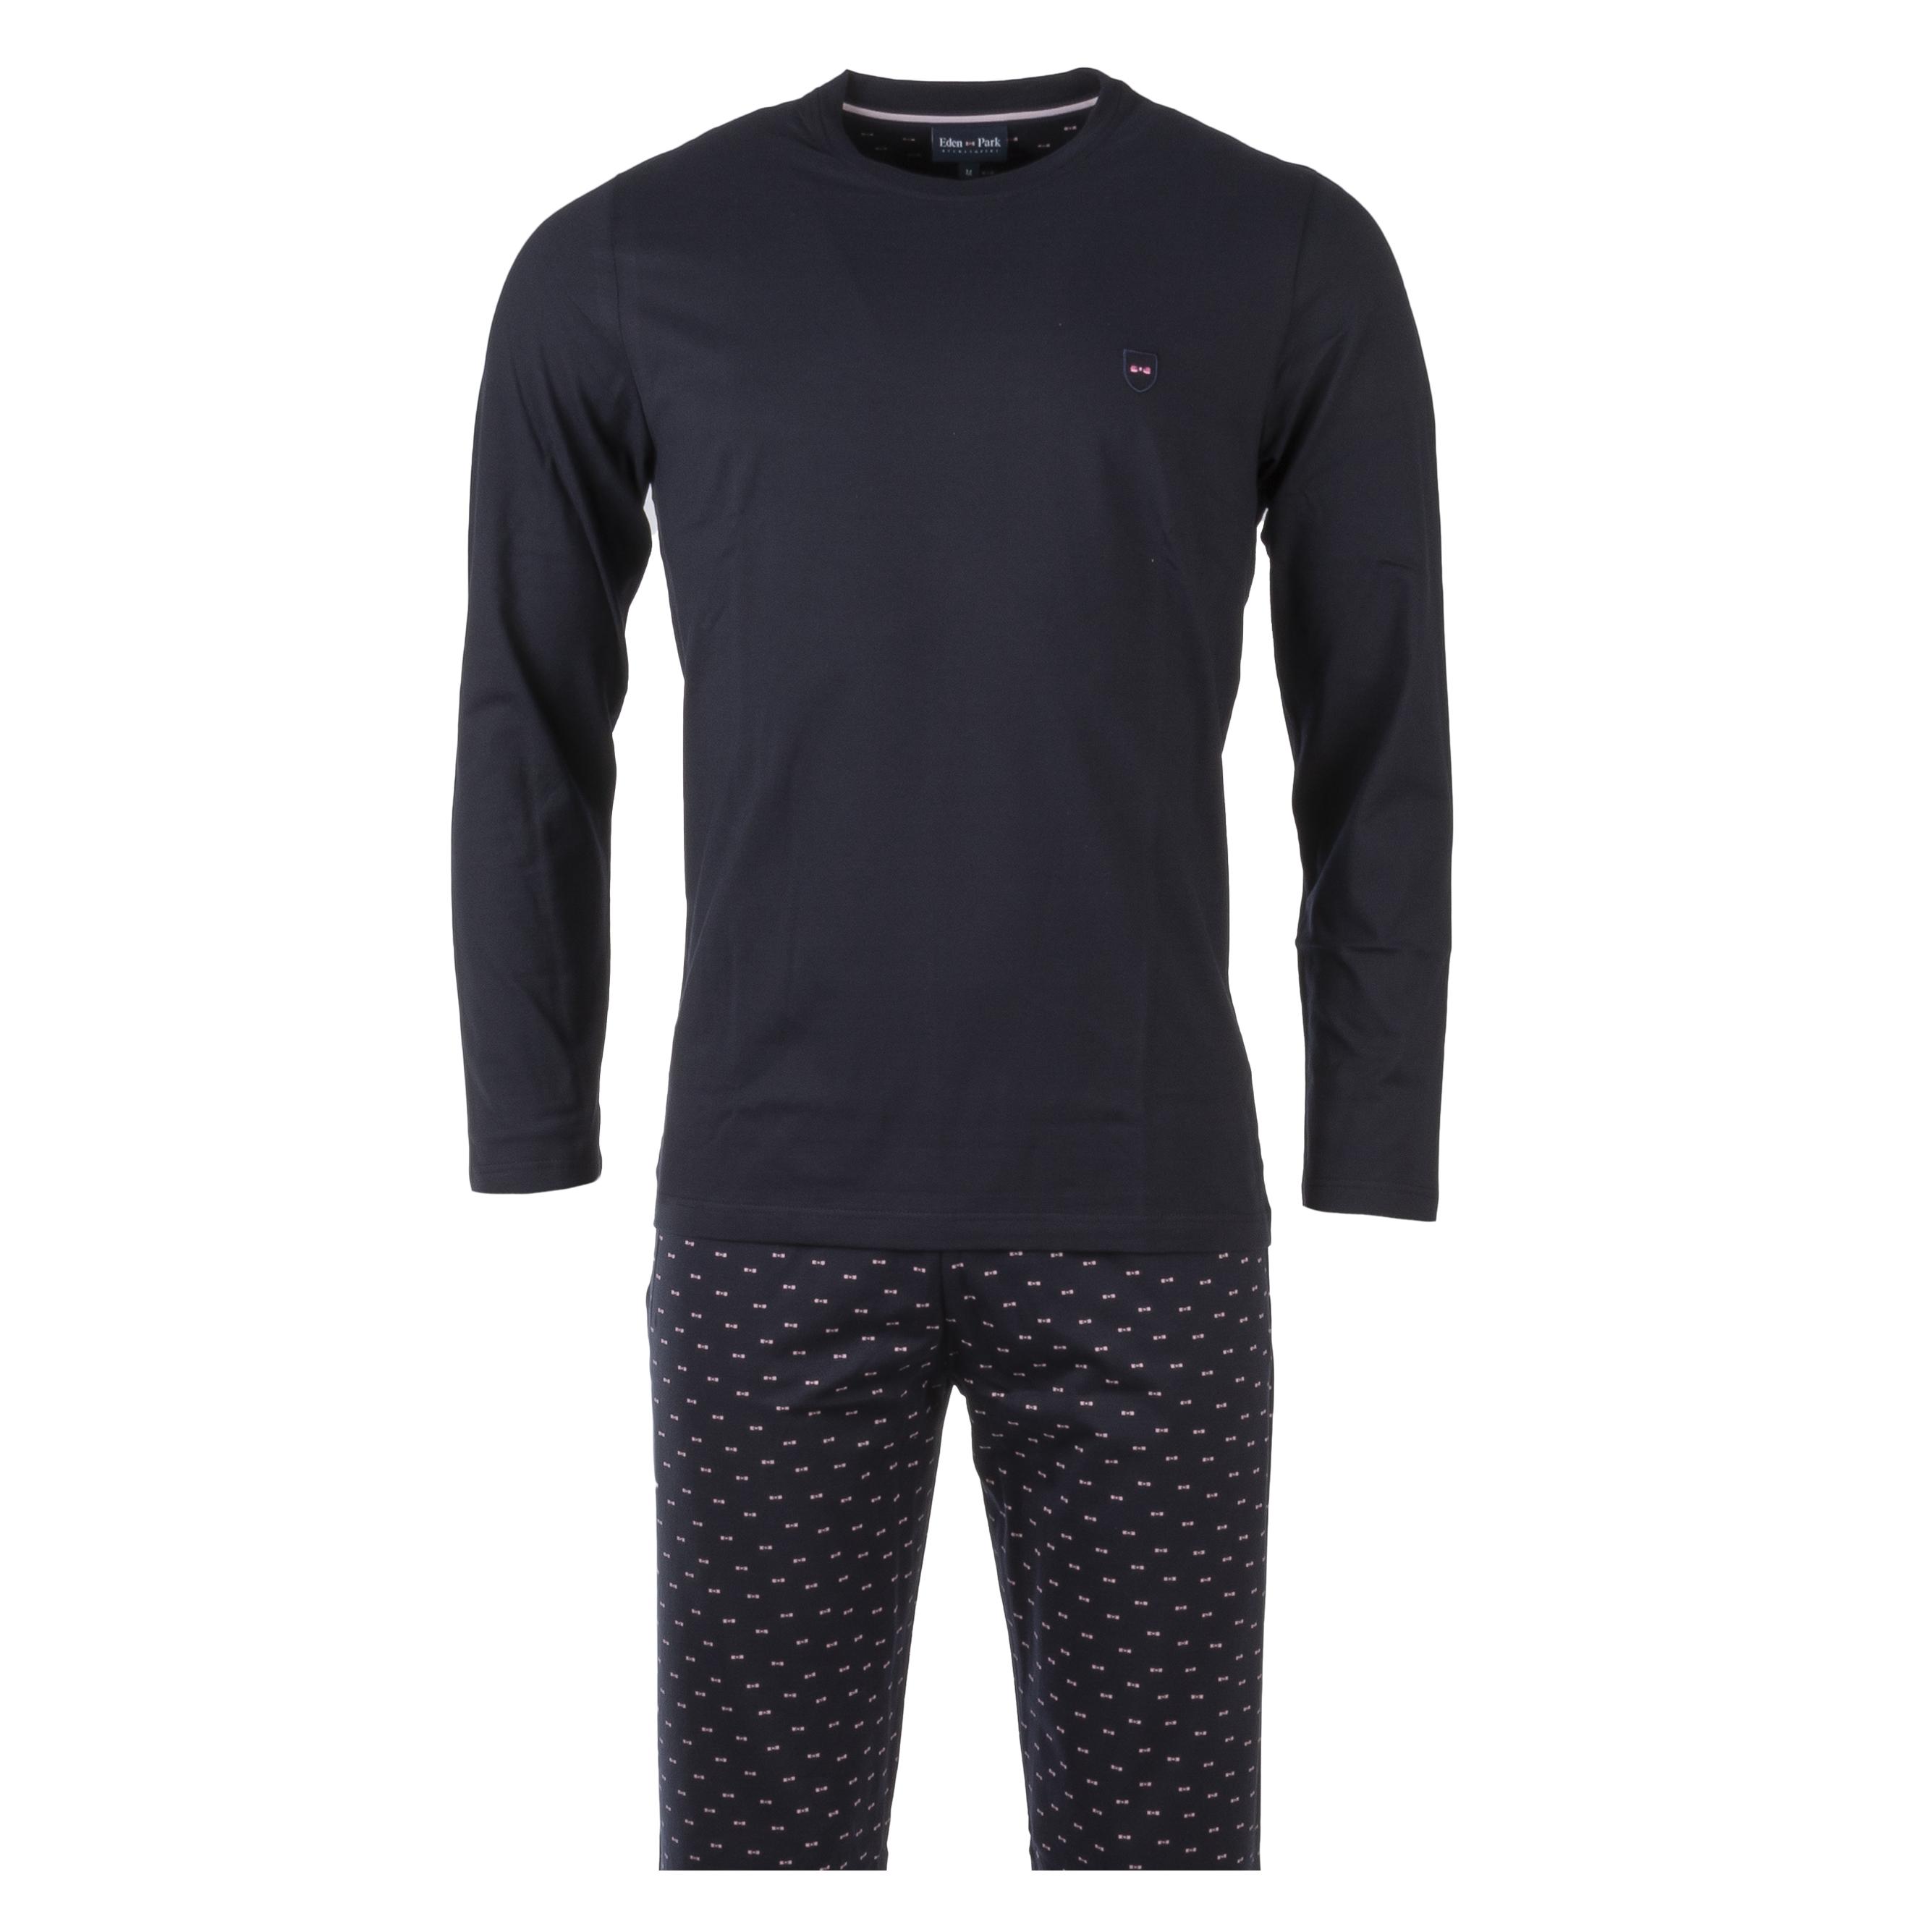 Pyjama long eden park en coton : tee-shirt manches longues col rond bleu marine et pantalon bleu marine logotypé